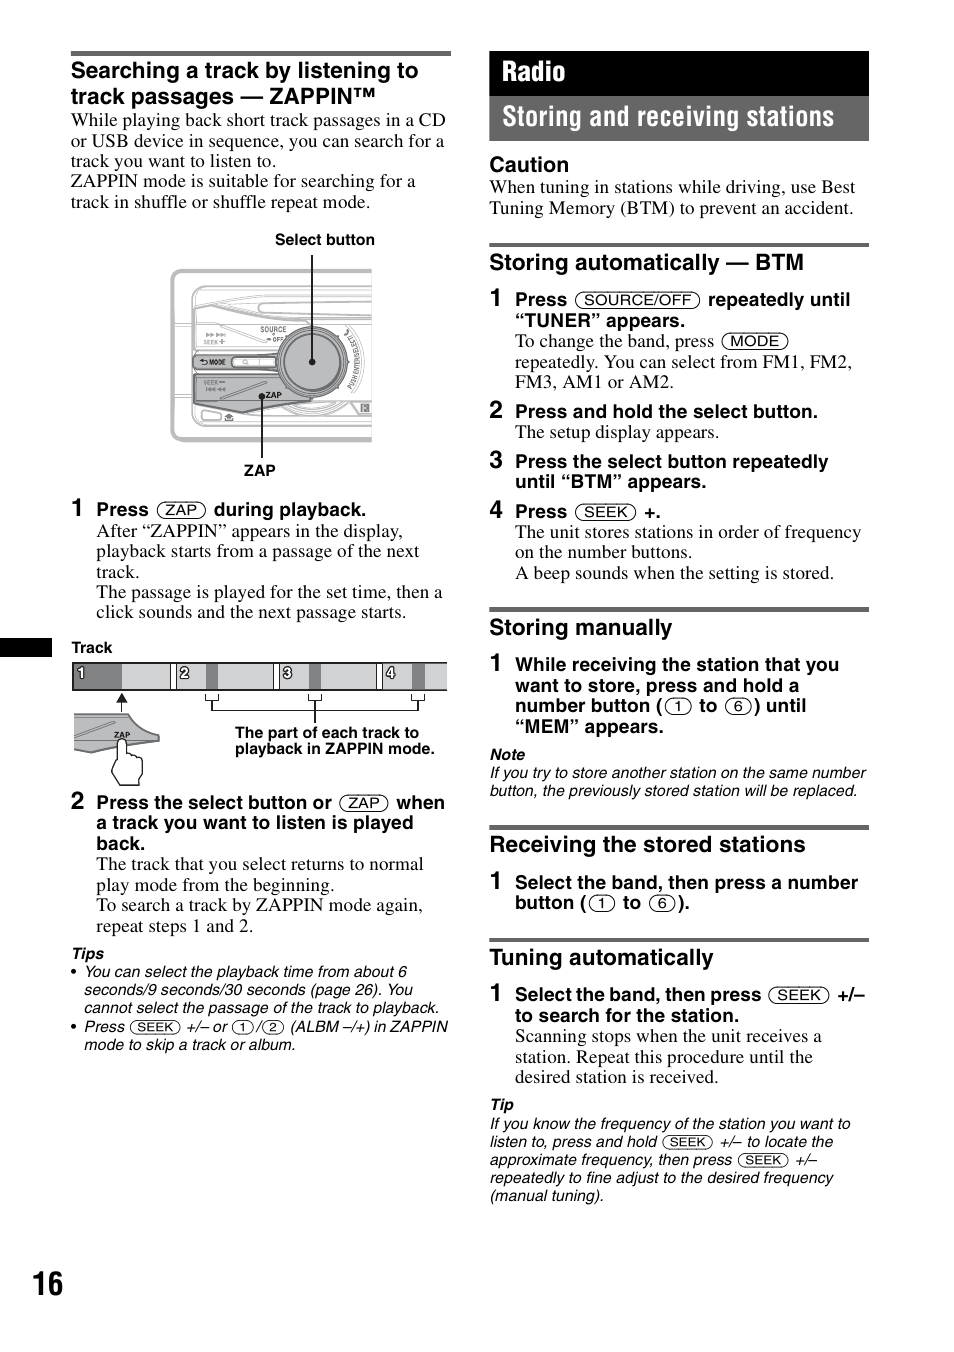 medium resolution of sony mex bt38uw user manual page 36 72 original mode